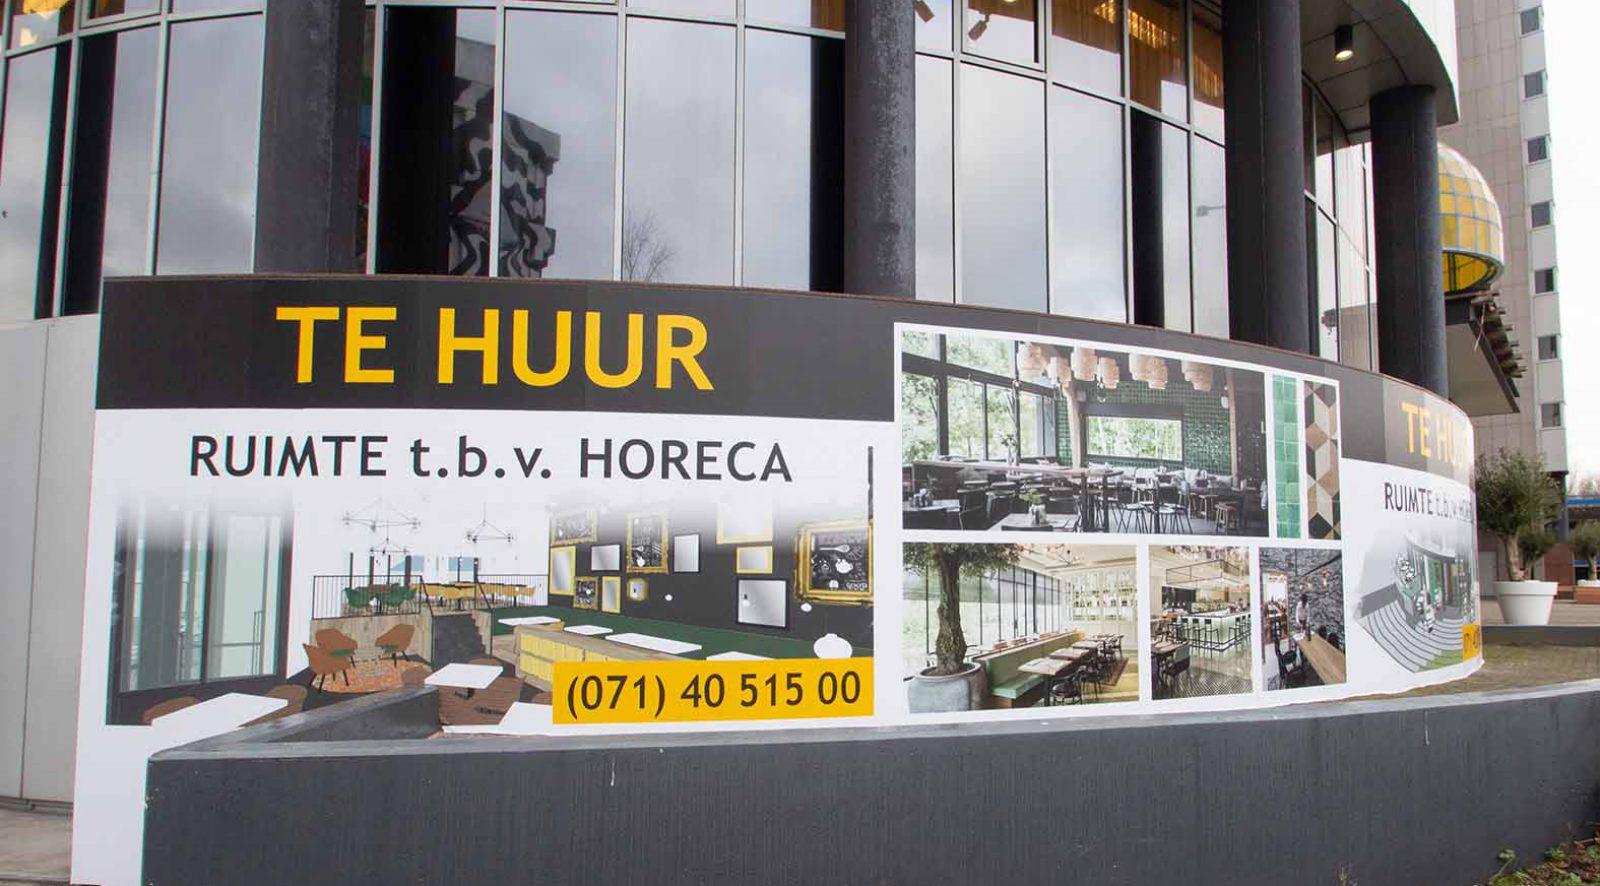 crown-business-center-zoetermeer-horeca-impressie